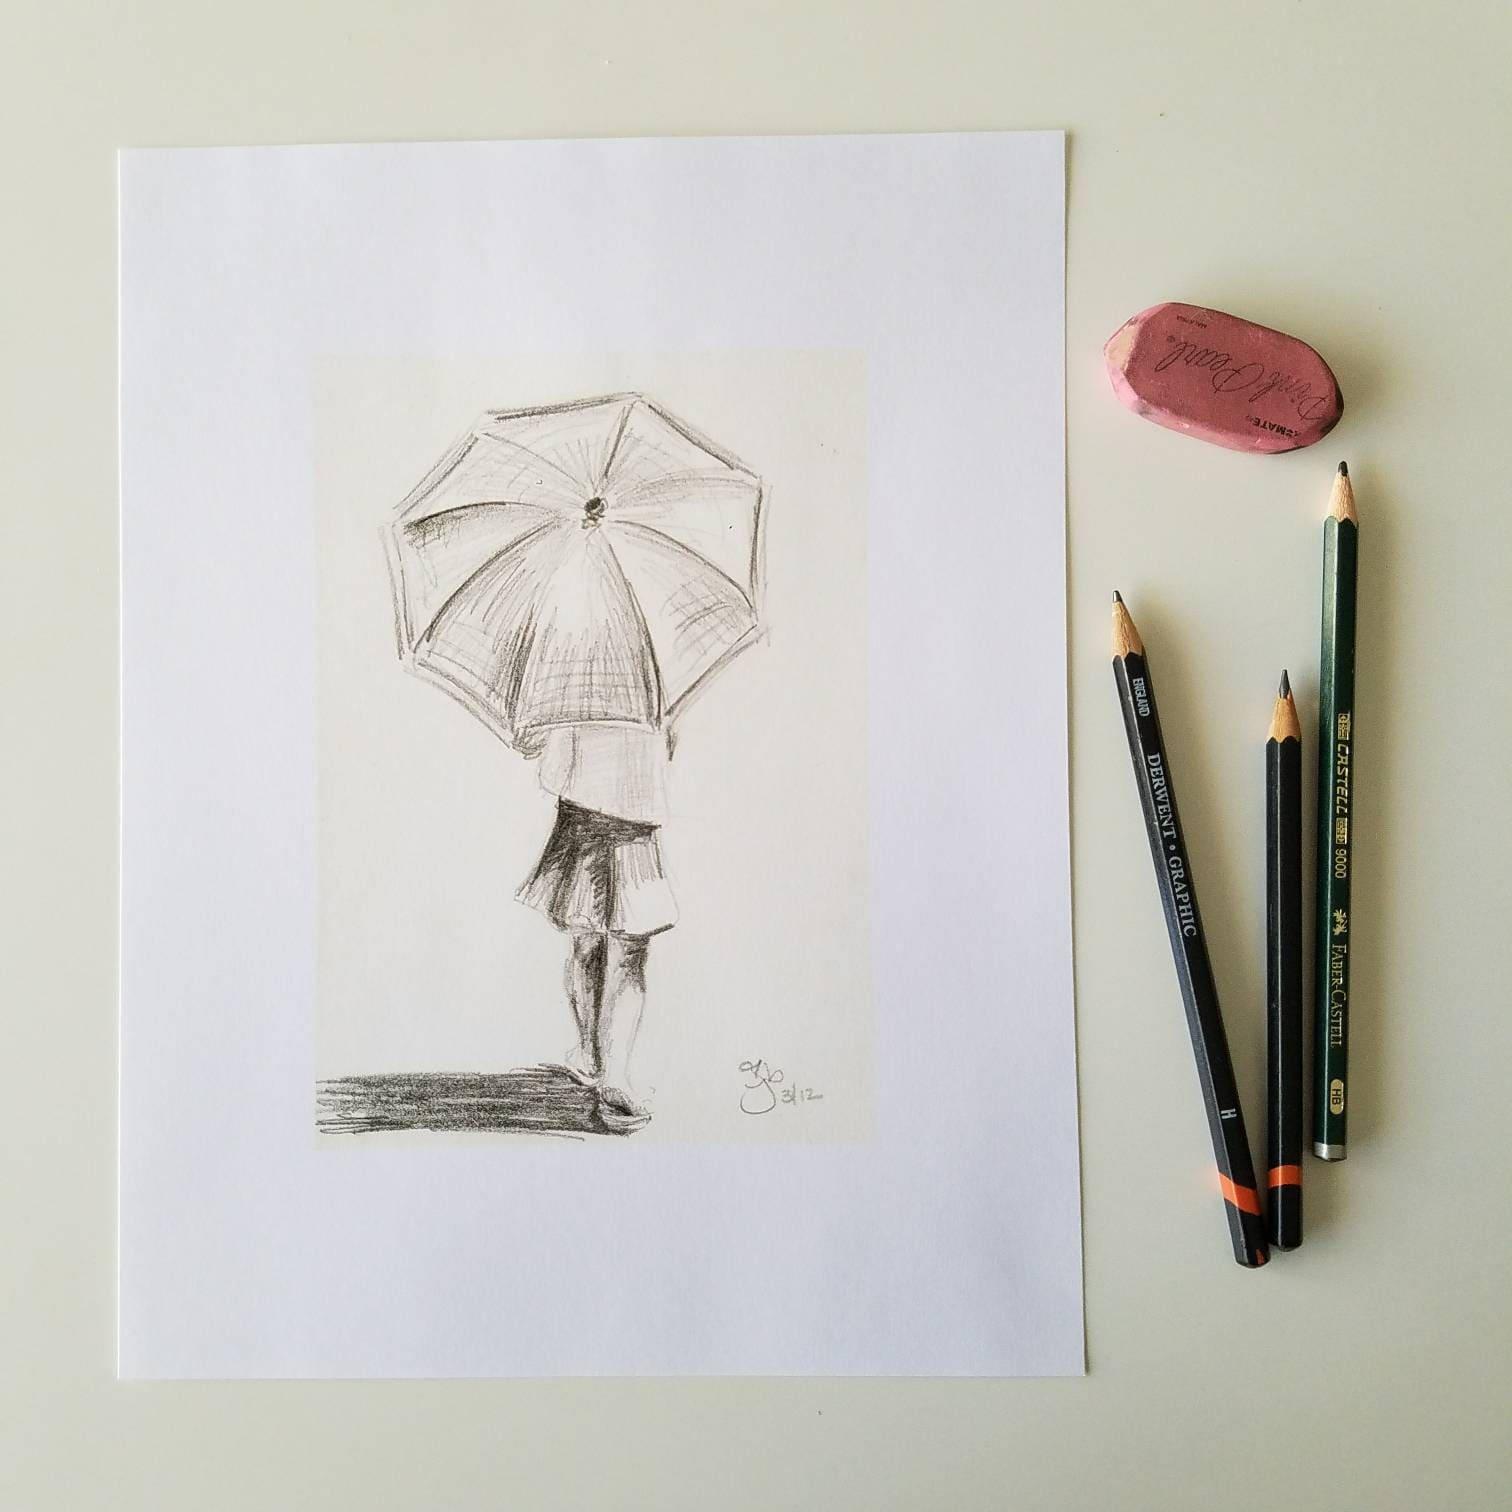 with umbrella 8x10 art print